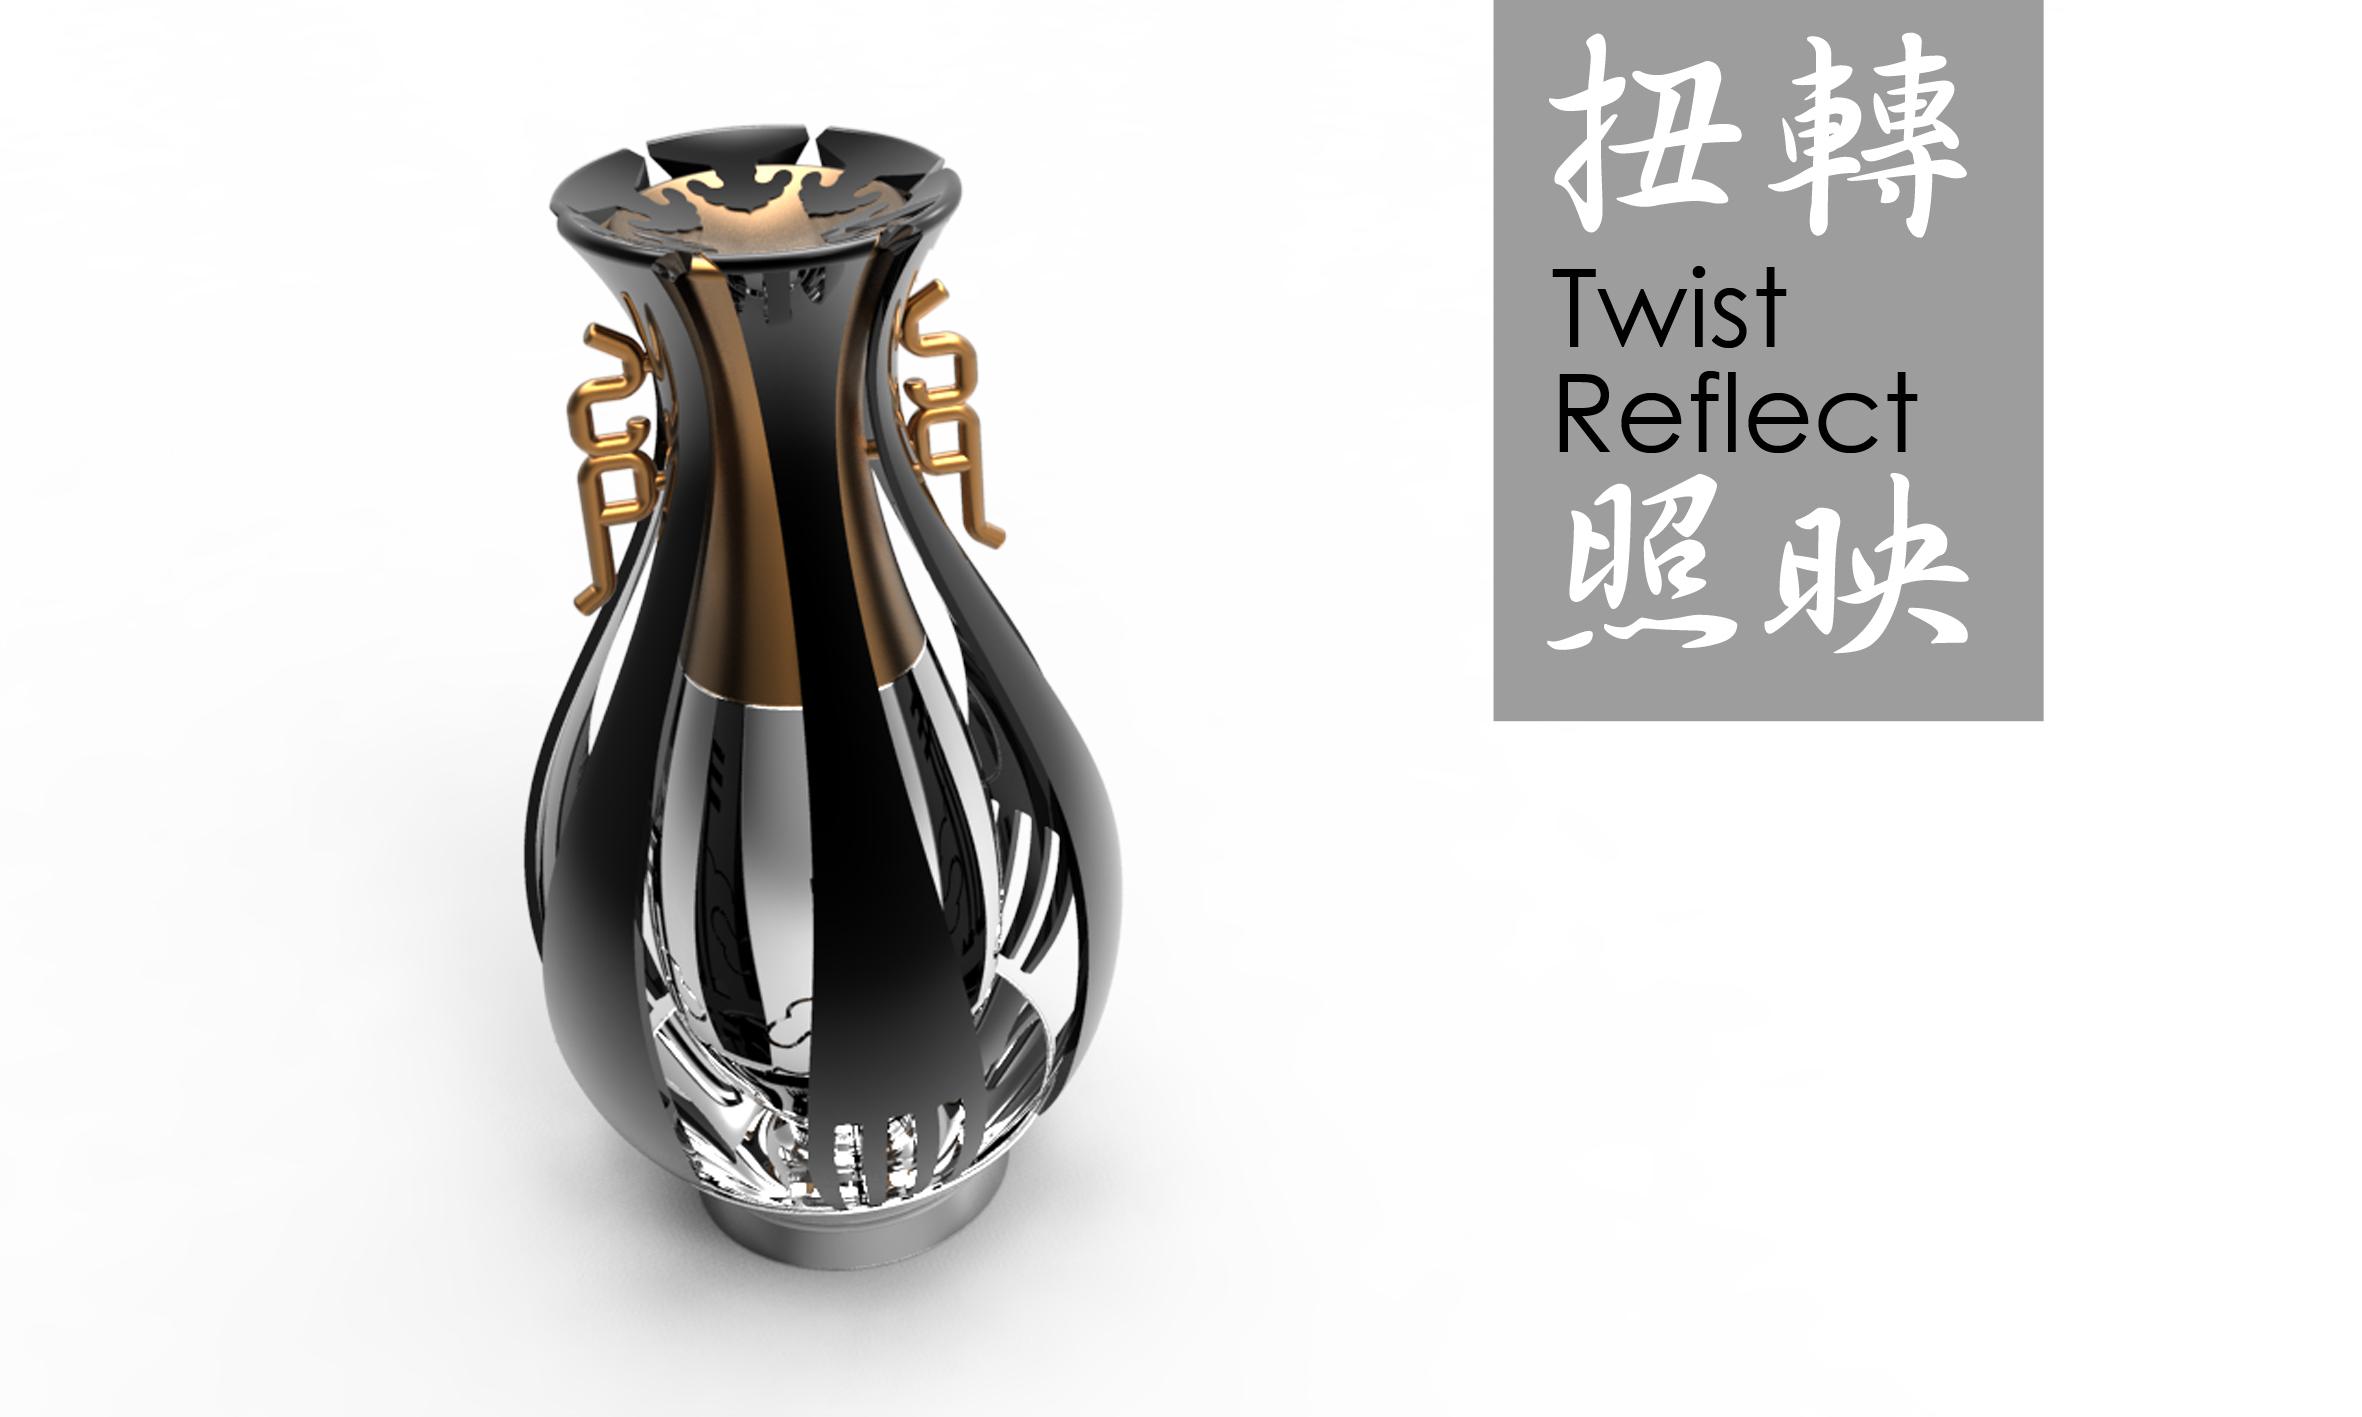 TWIST REFLECT